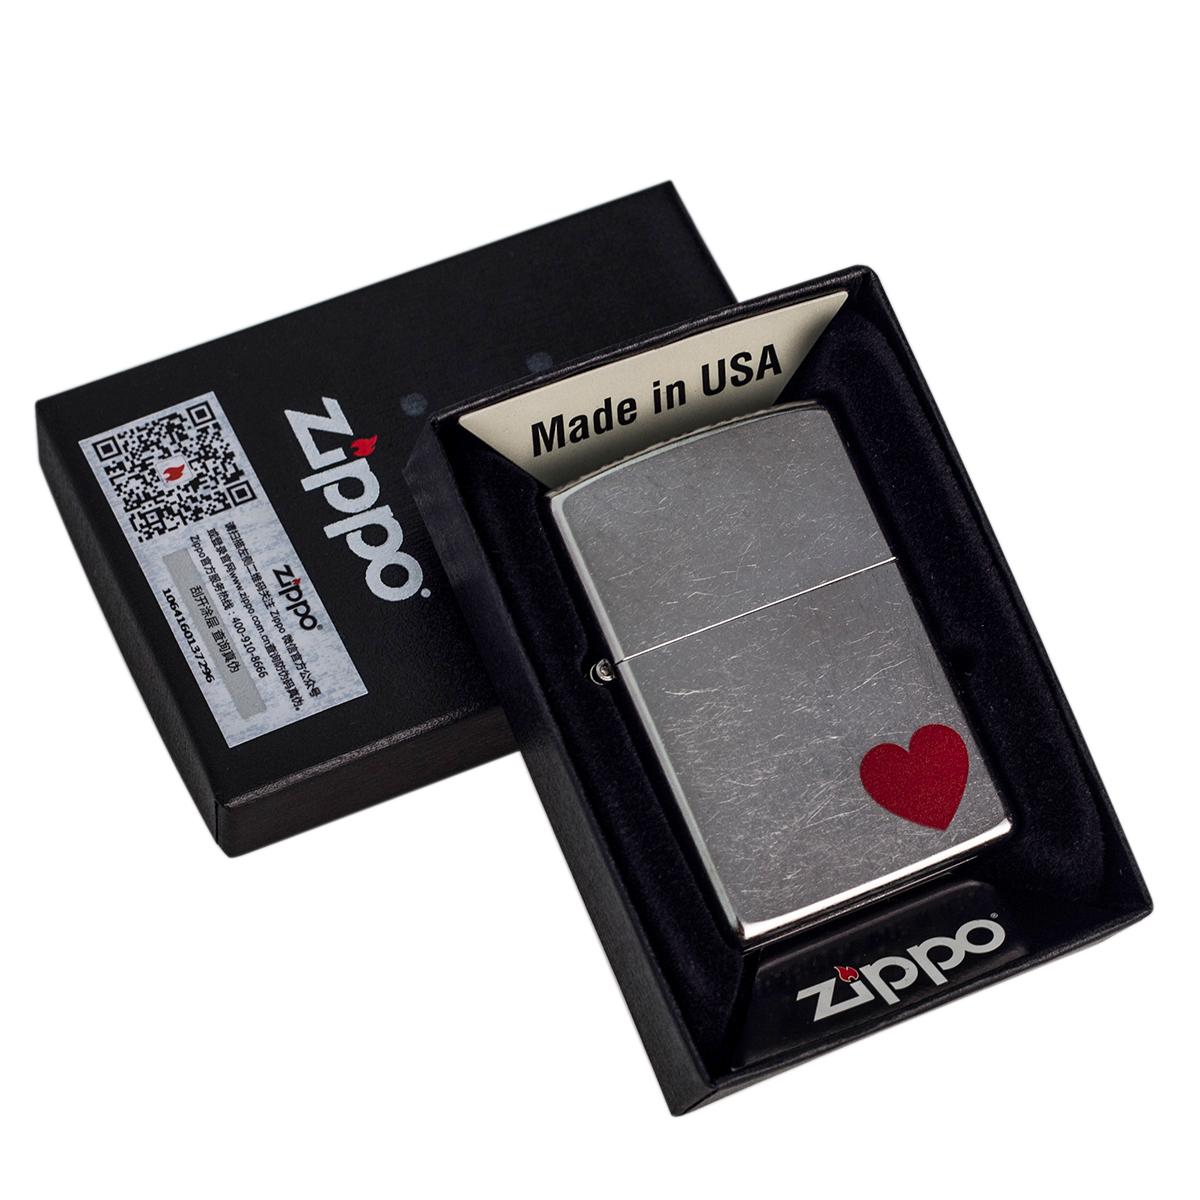 ZIPPO正版打火机 角落里的爱29060 恋爱礼物 芝宝官方正品ZIPPO